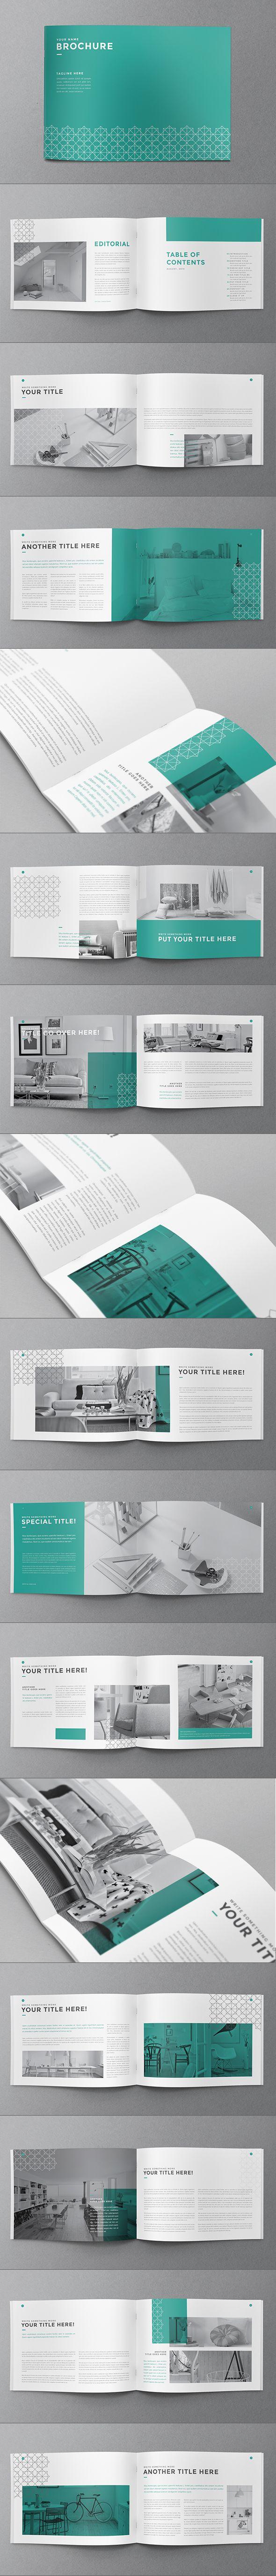 Minimal Pattern Brochure. Download here: http://graphicriver.net/item/minimal-pattern-brochure/12751211?ref=abradesign